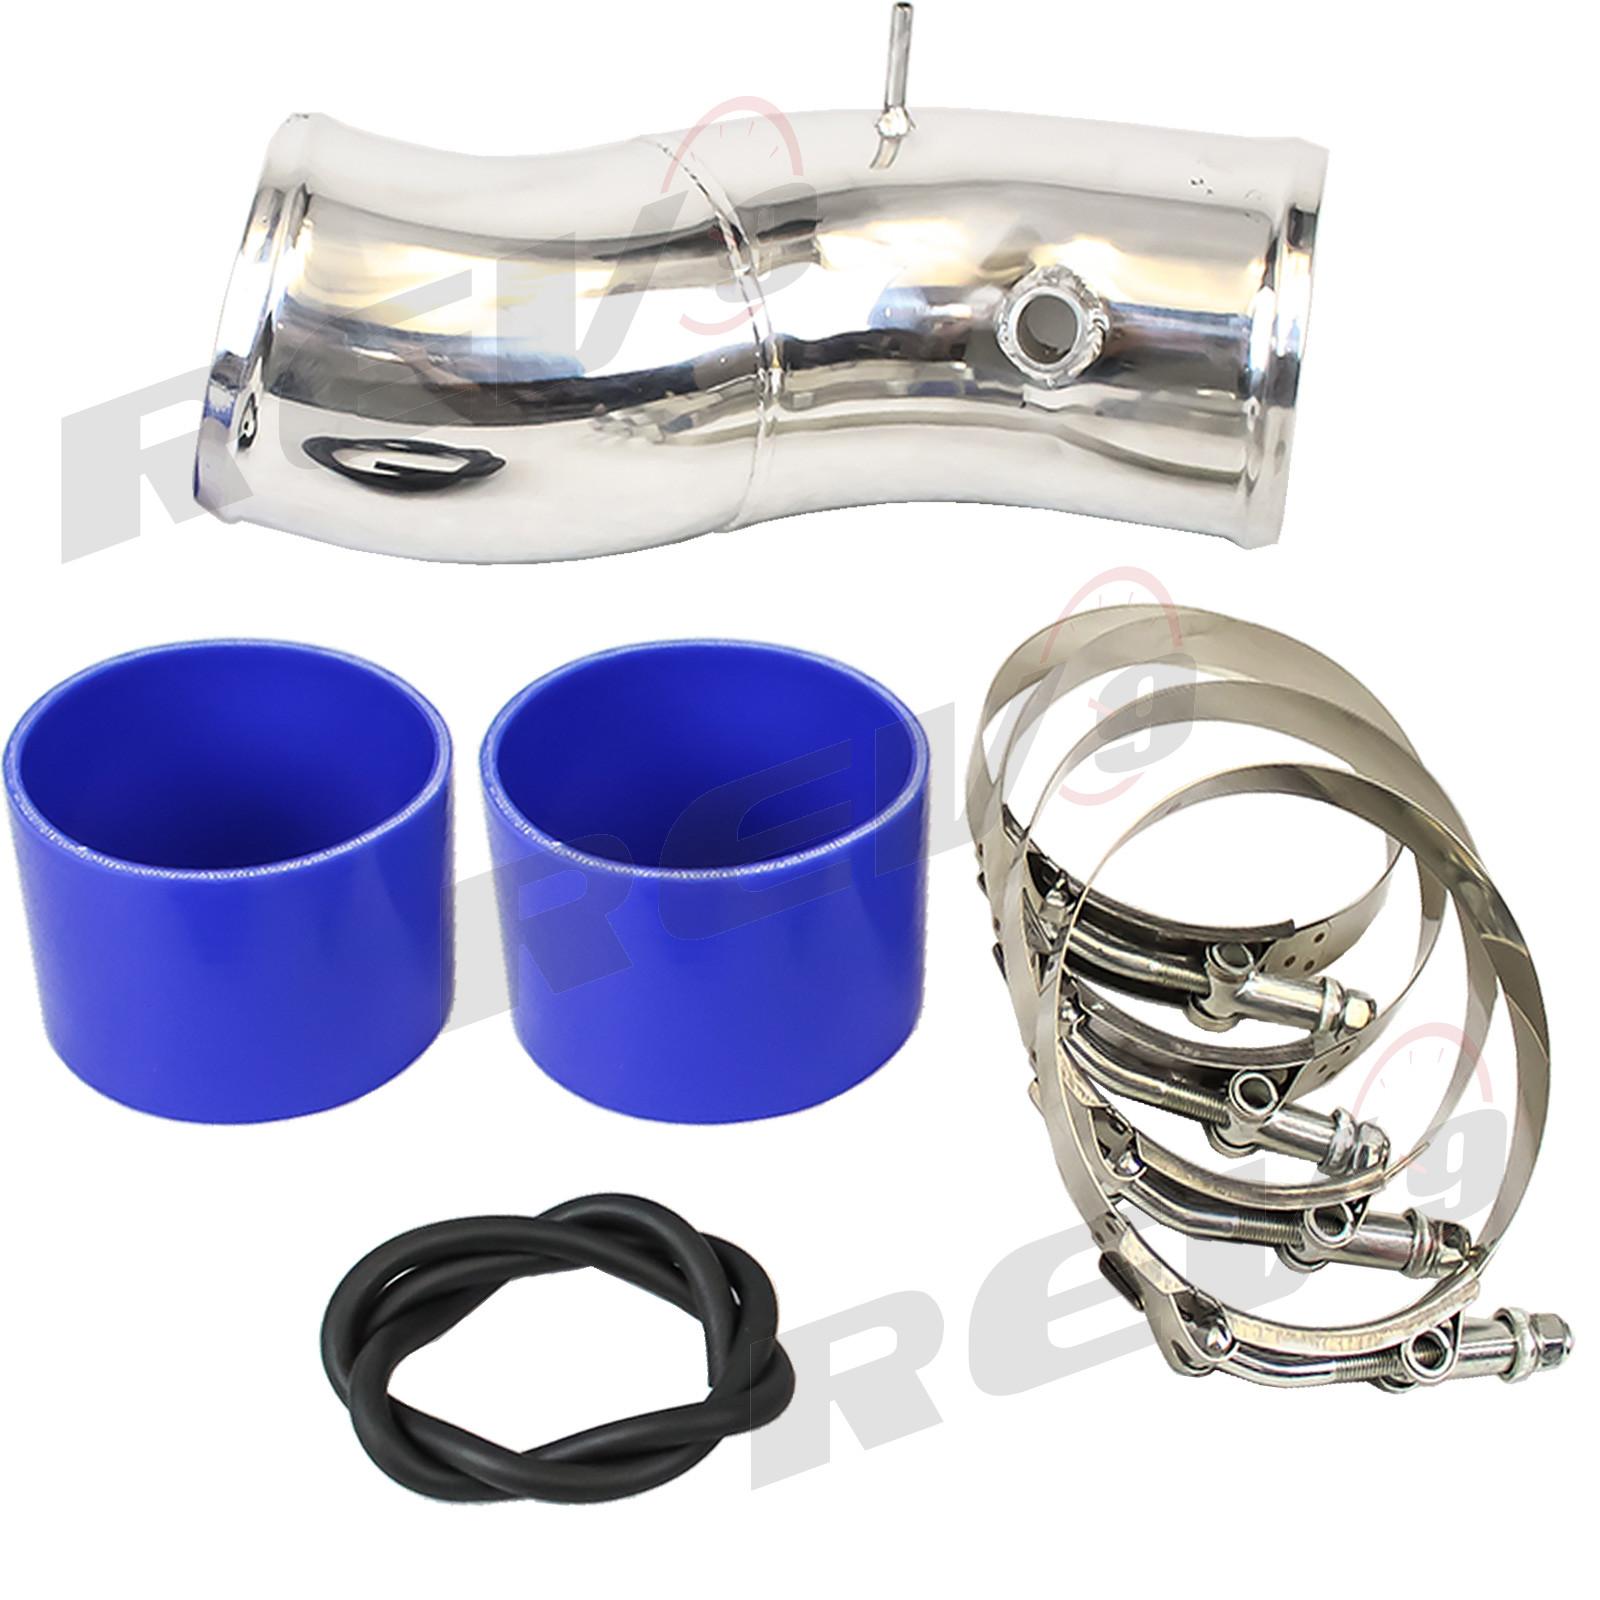 "For 99-03 Ford Super Duty 7.3L PowerStroke Diesel GTP38 4/"" Air Intake Pipe Kit"